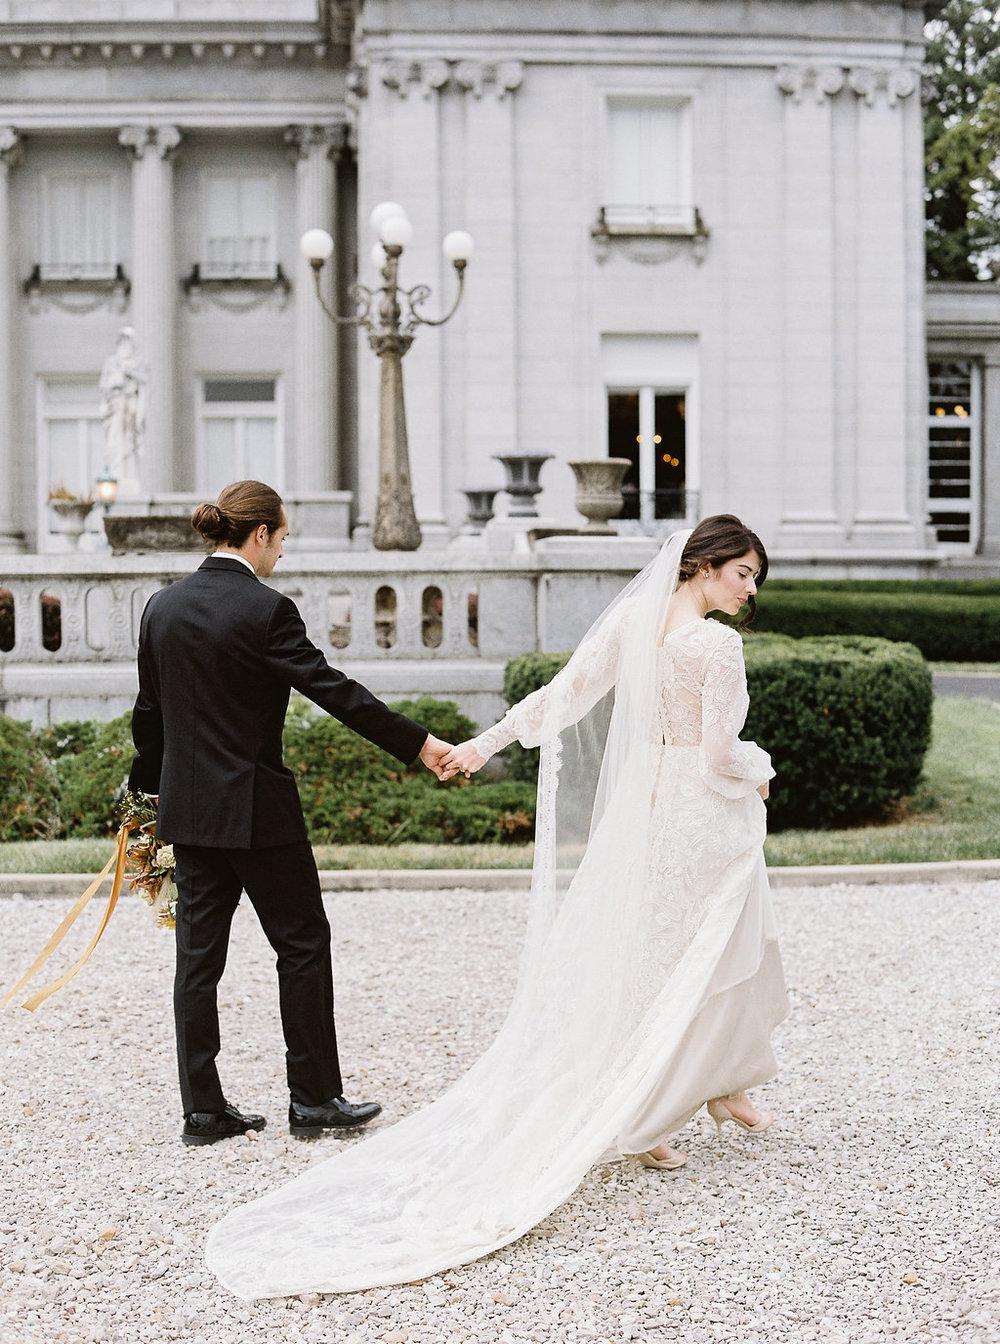 fall-wedding-Jenny-haas-Samantha-joy-events-laurel-court-cincinnati-wedding-bride-and-groom3